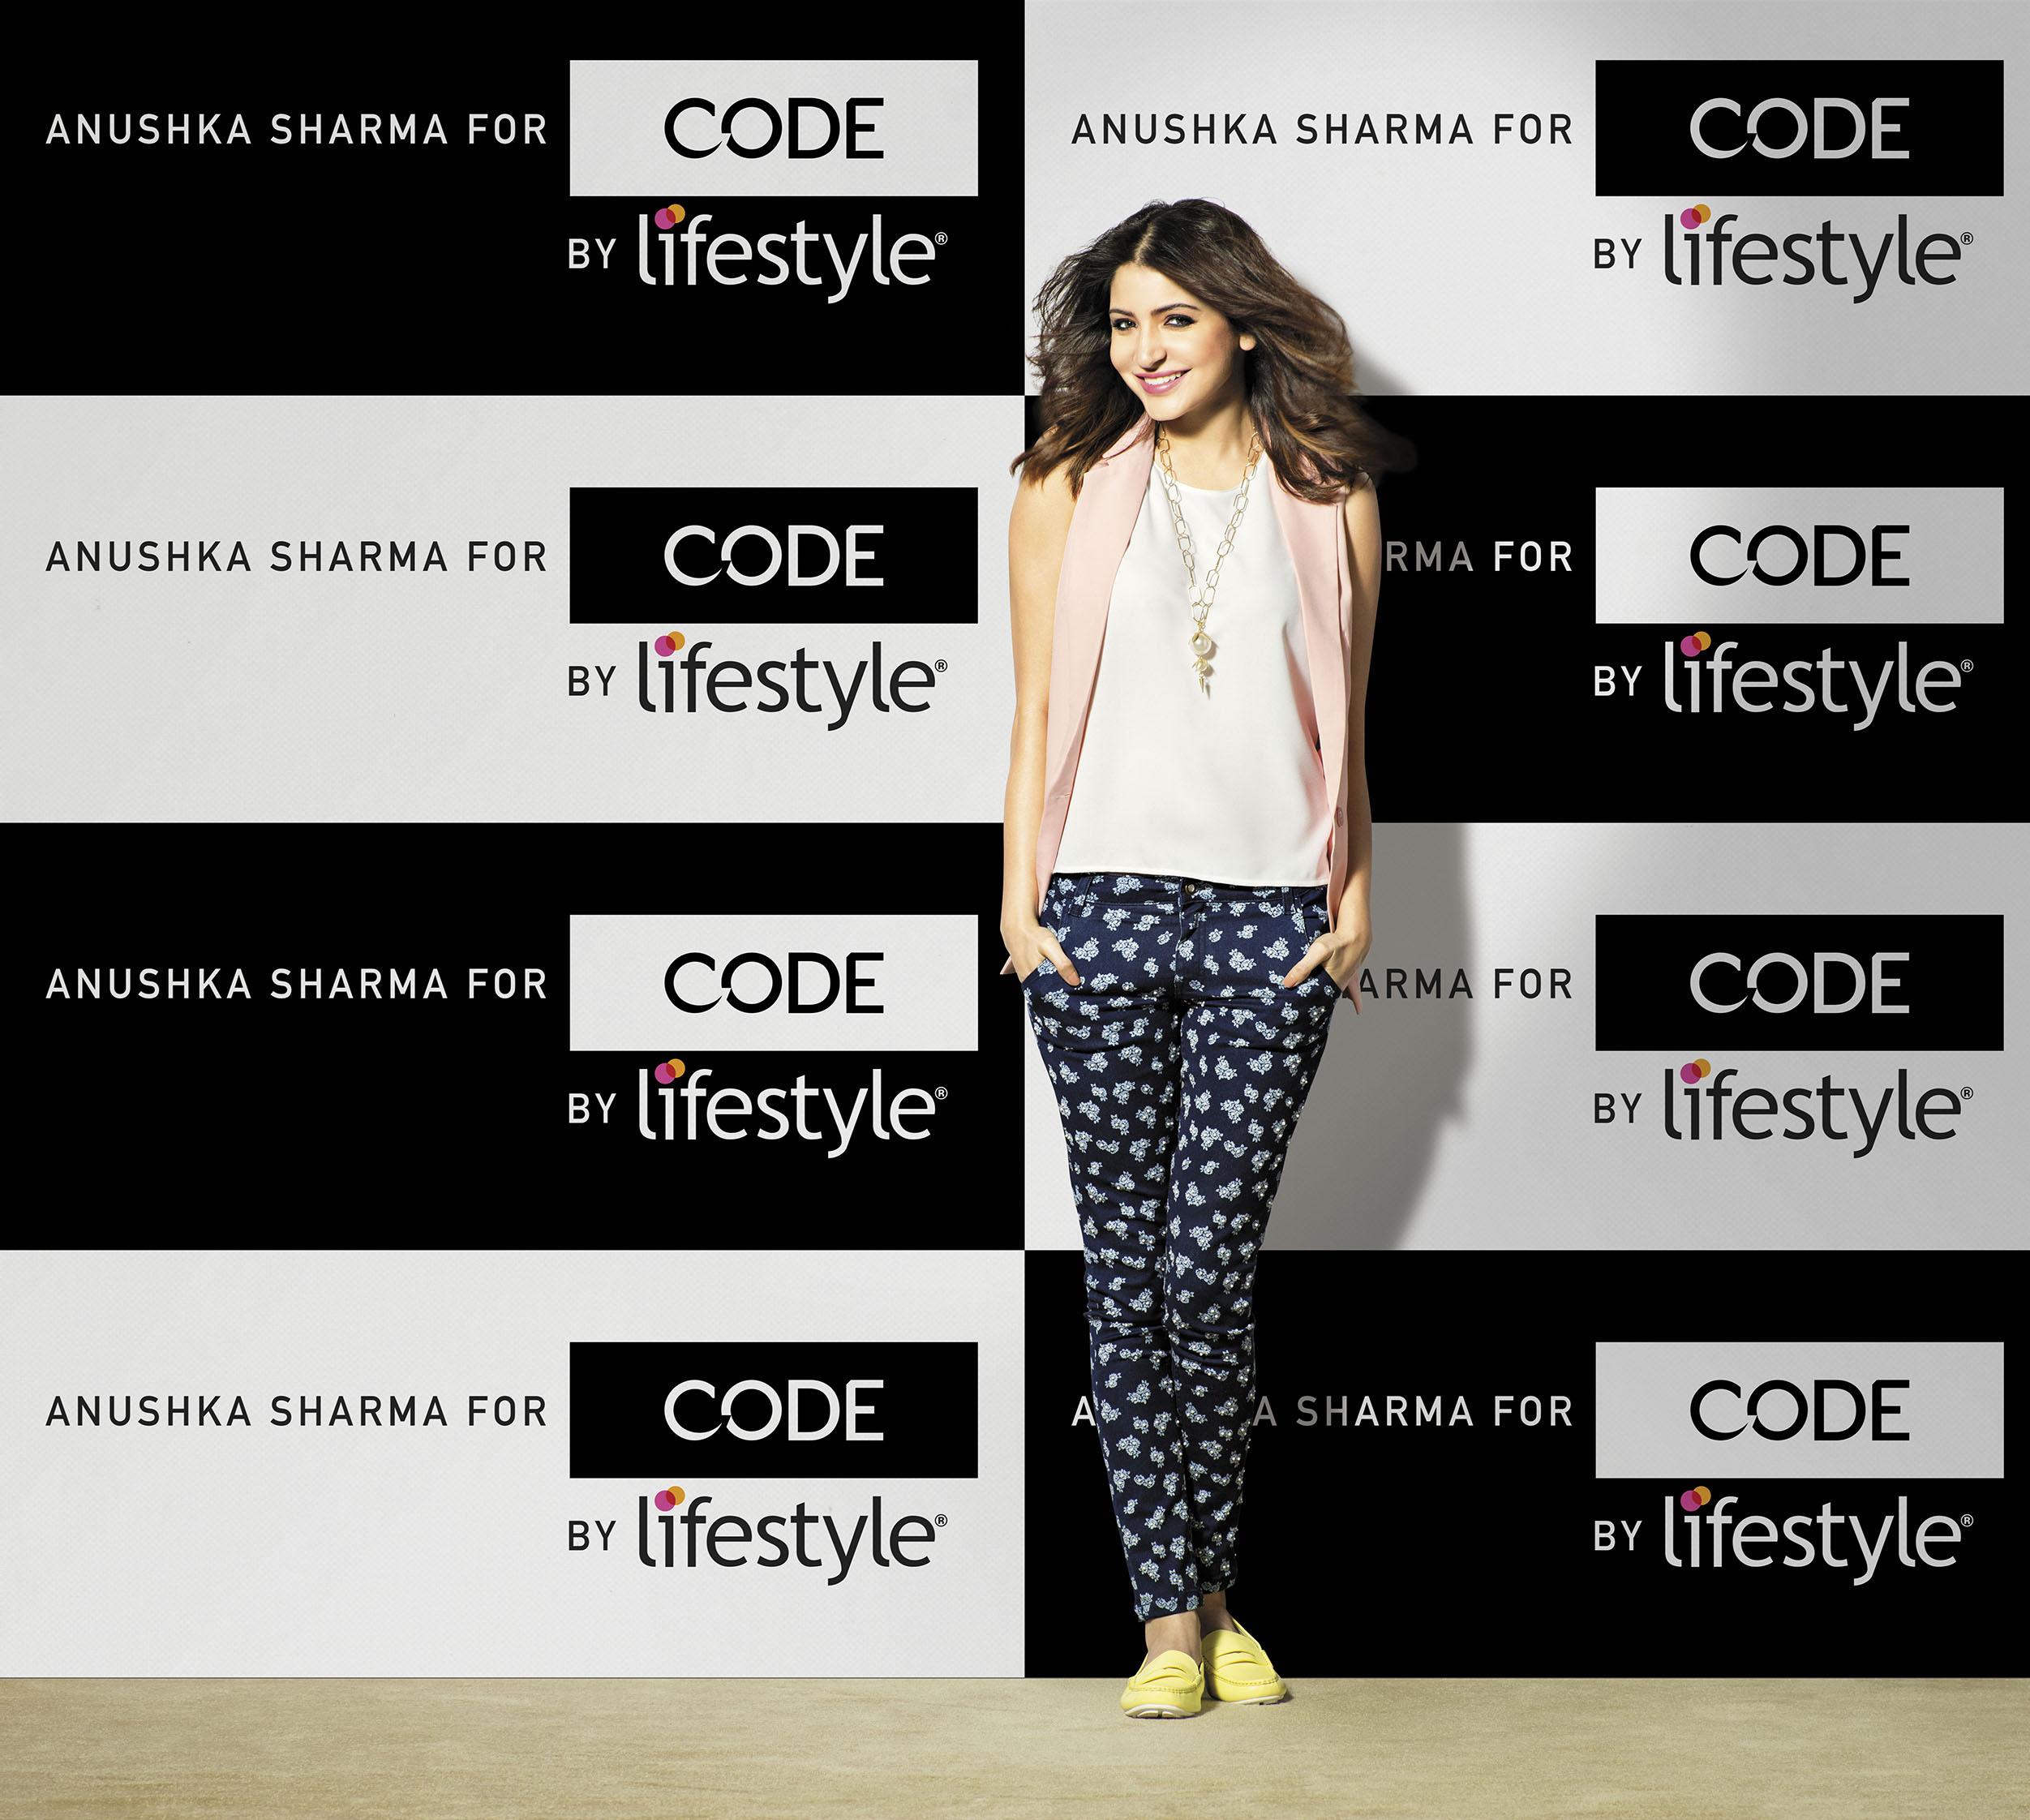 9c13e3cc0d Anushka Sharma signed on as Brand Ambassador for 'Code by Lifestyle ...